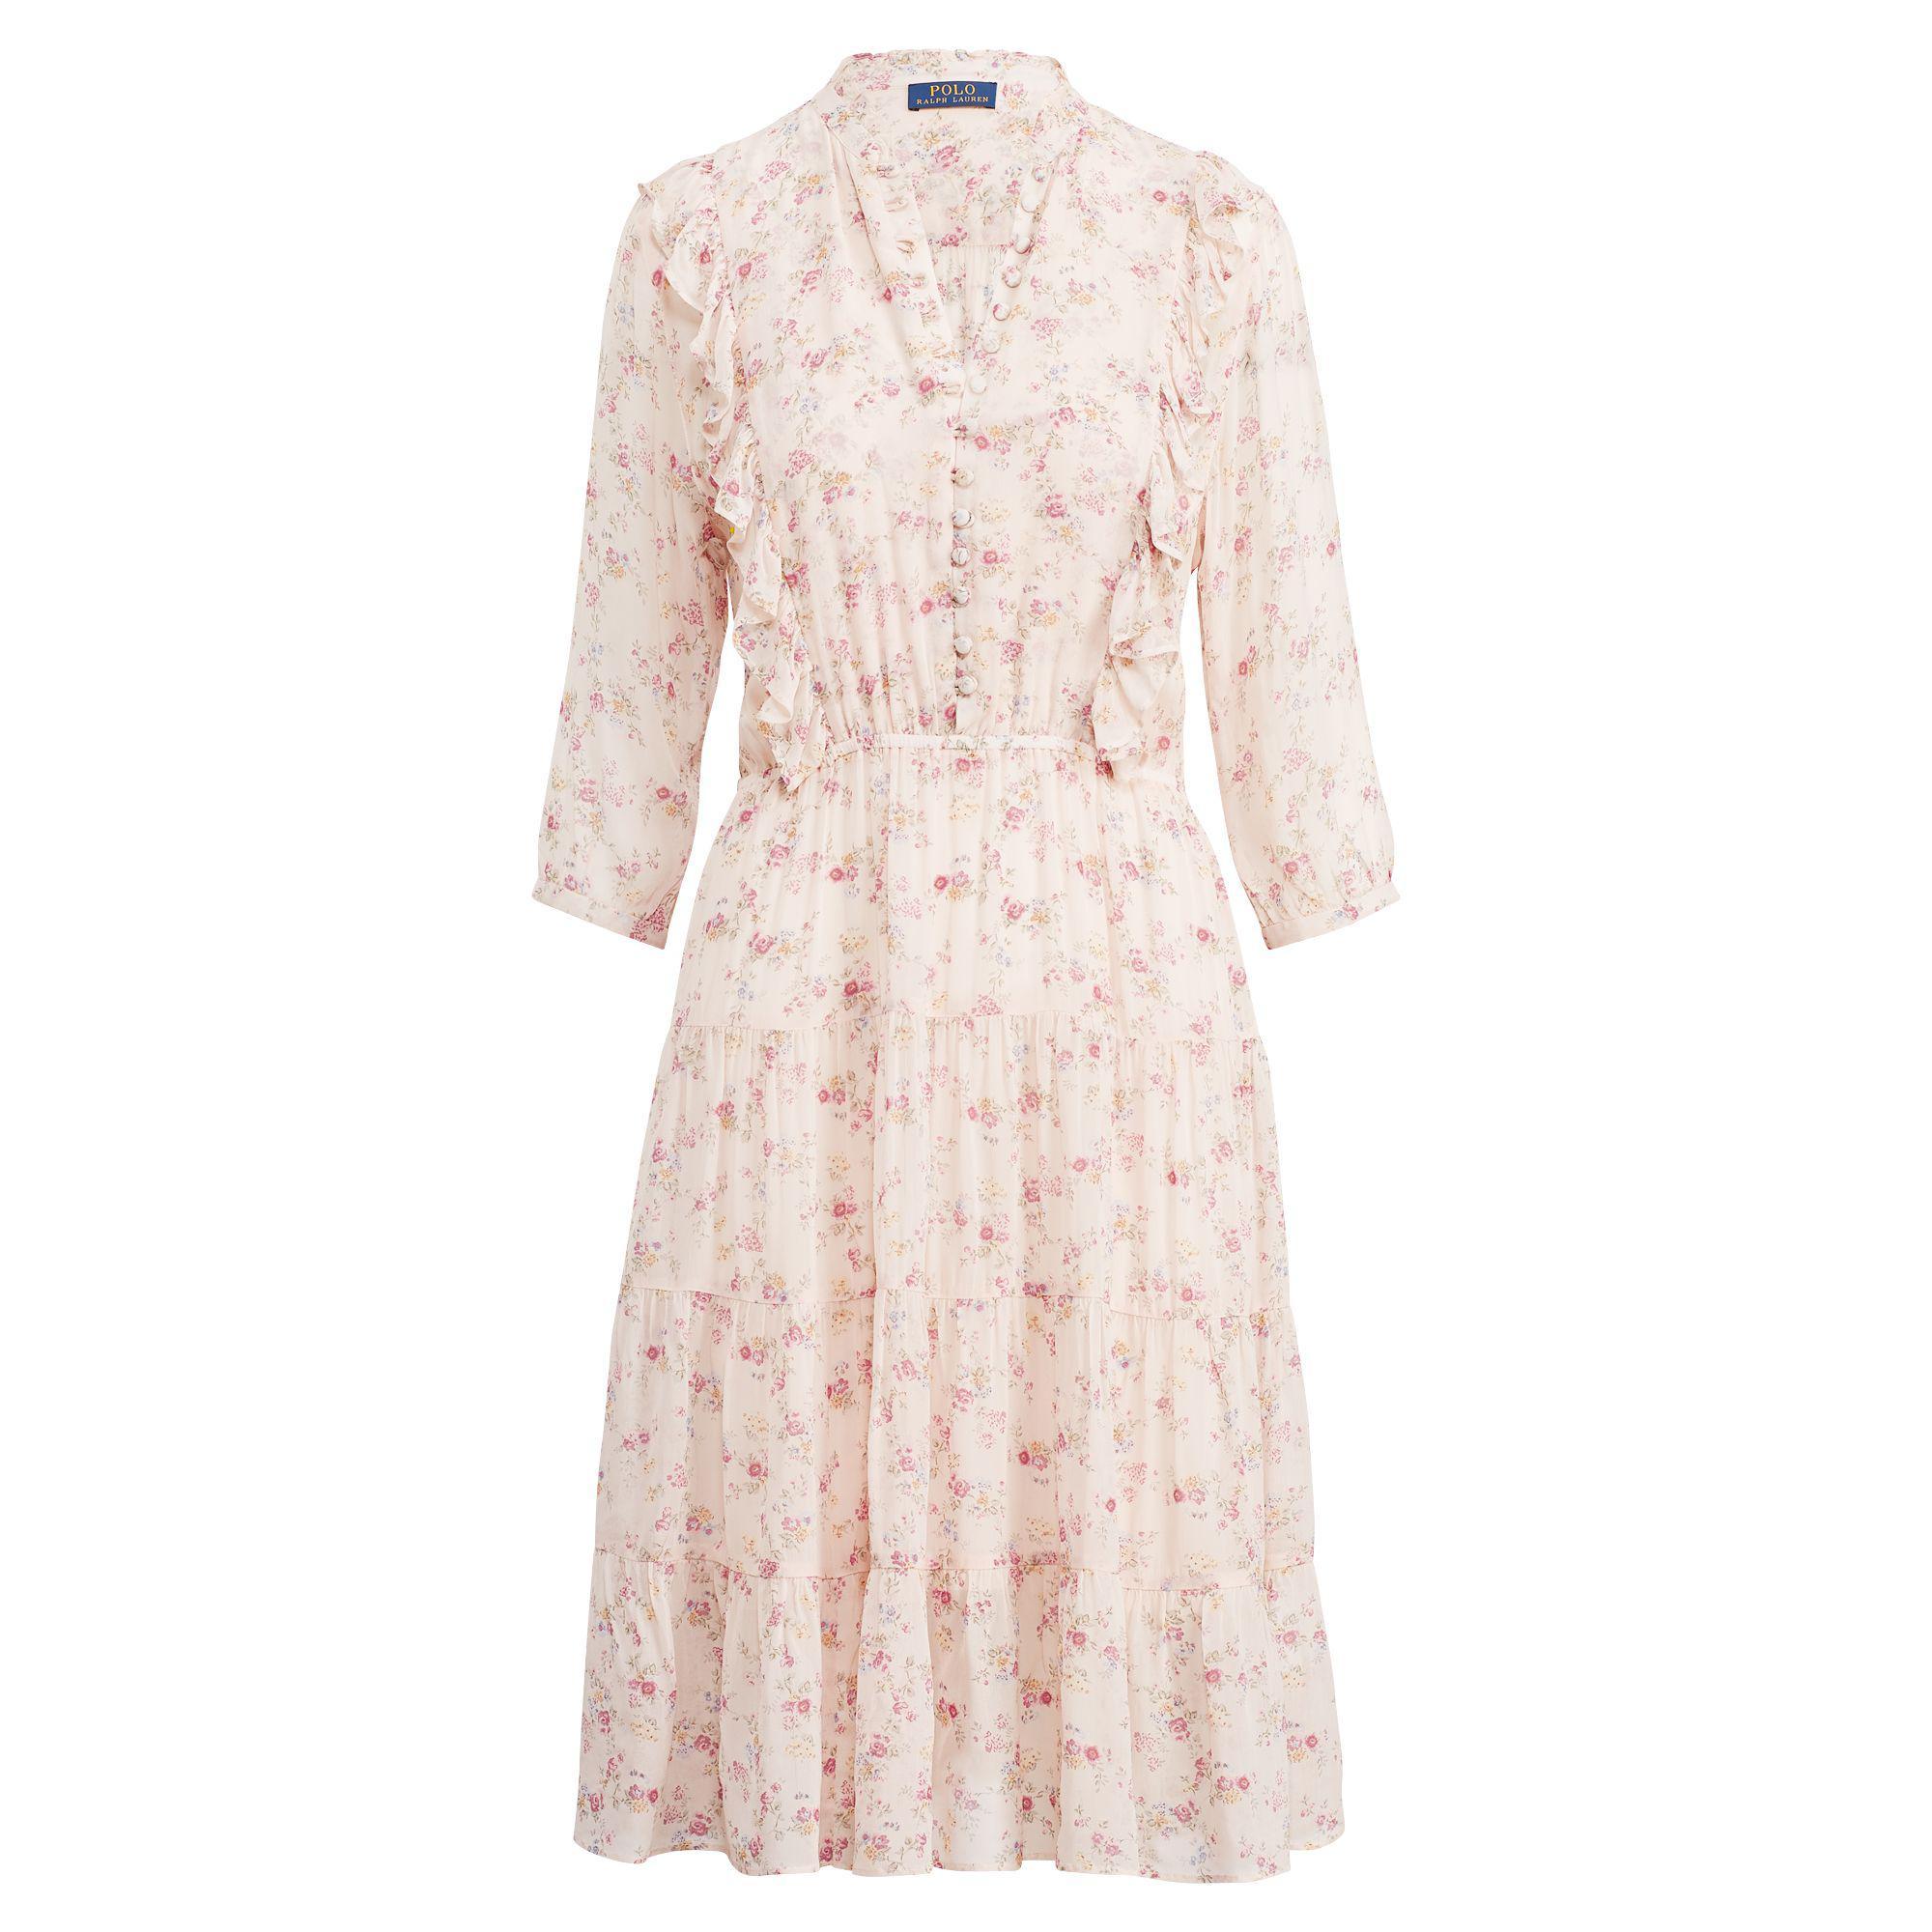 30d96c1b631 Polo Ralph Lauren - Multicolor Floral Gauze Dress - Lyst. View fullscreen